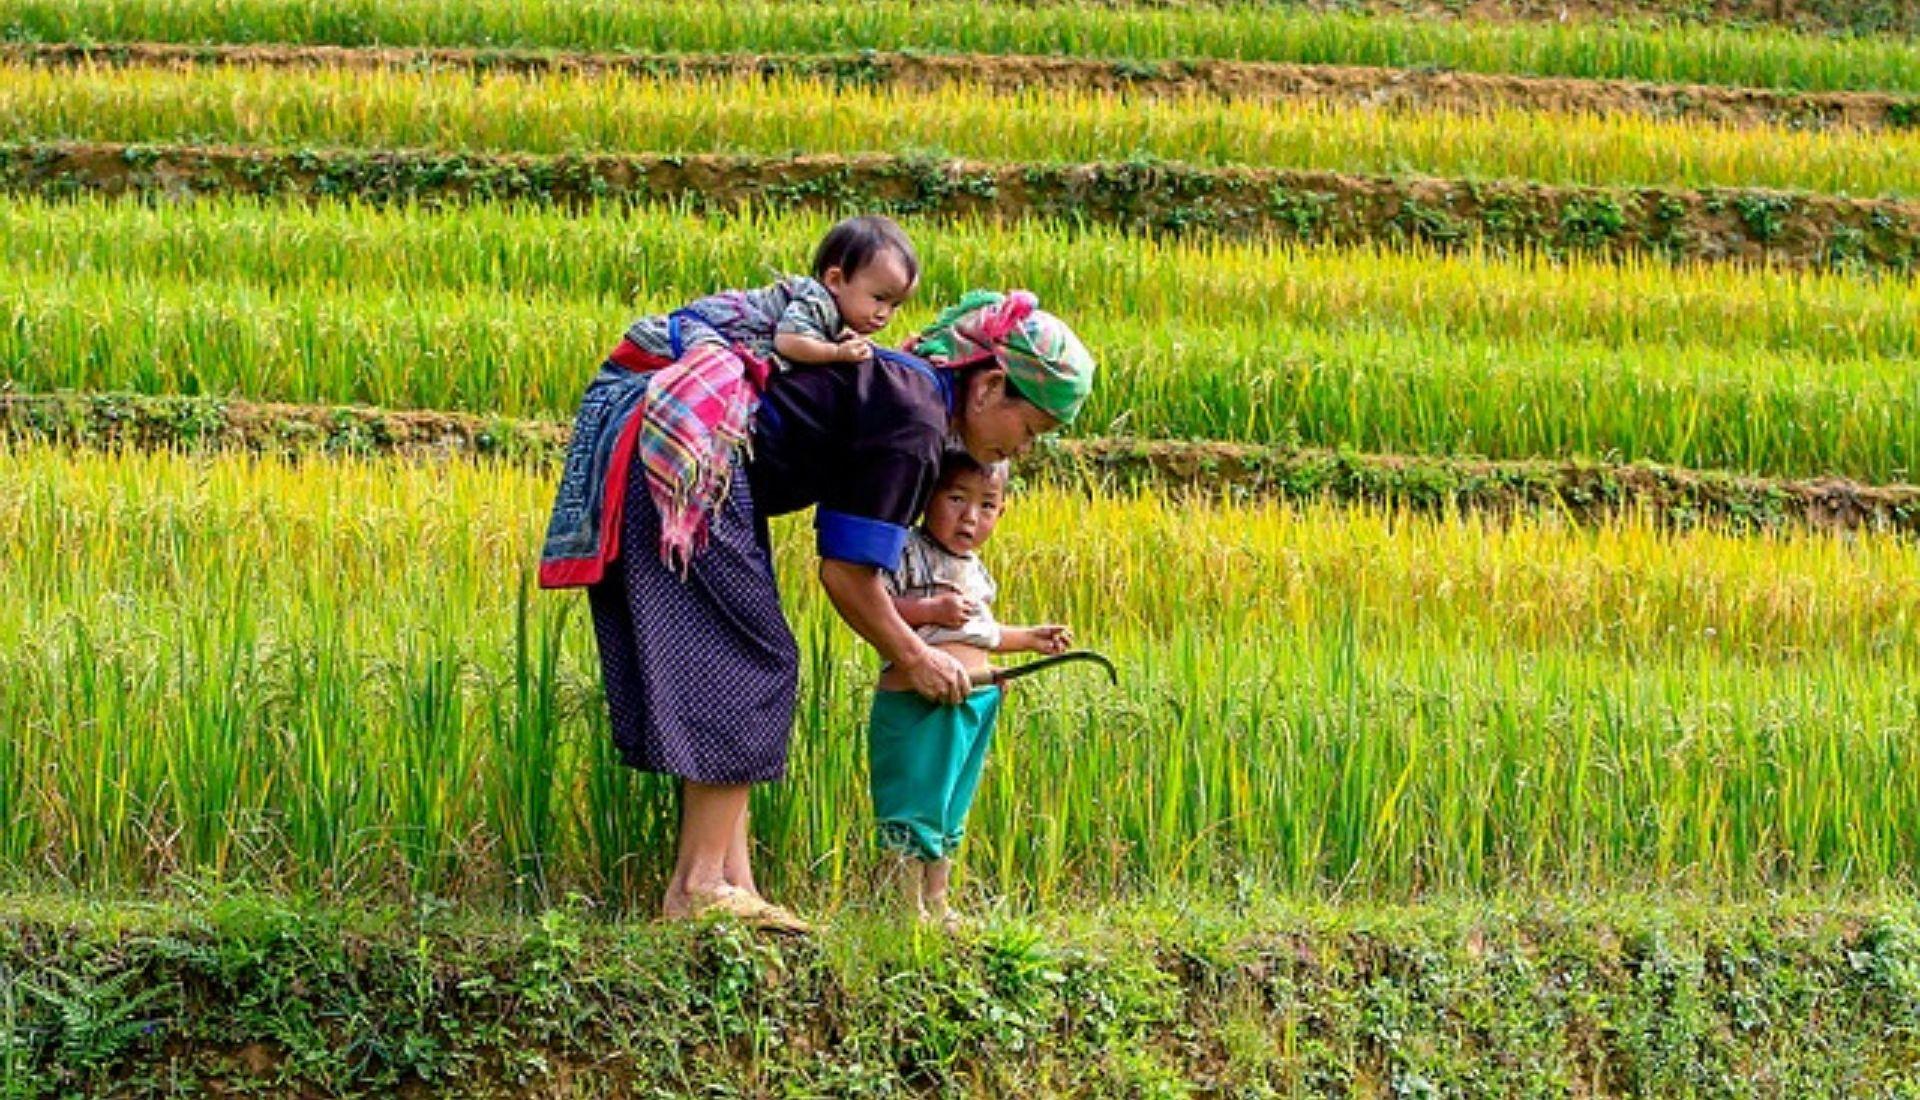 Visit the Ethnic Groups of Vietnam